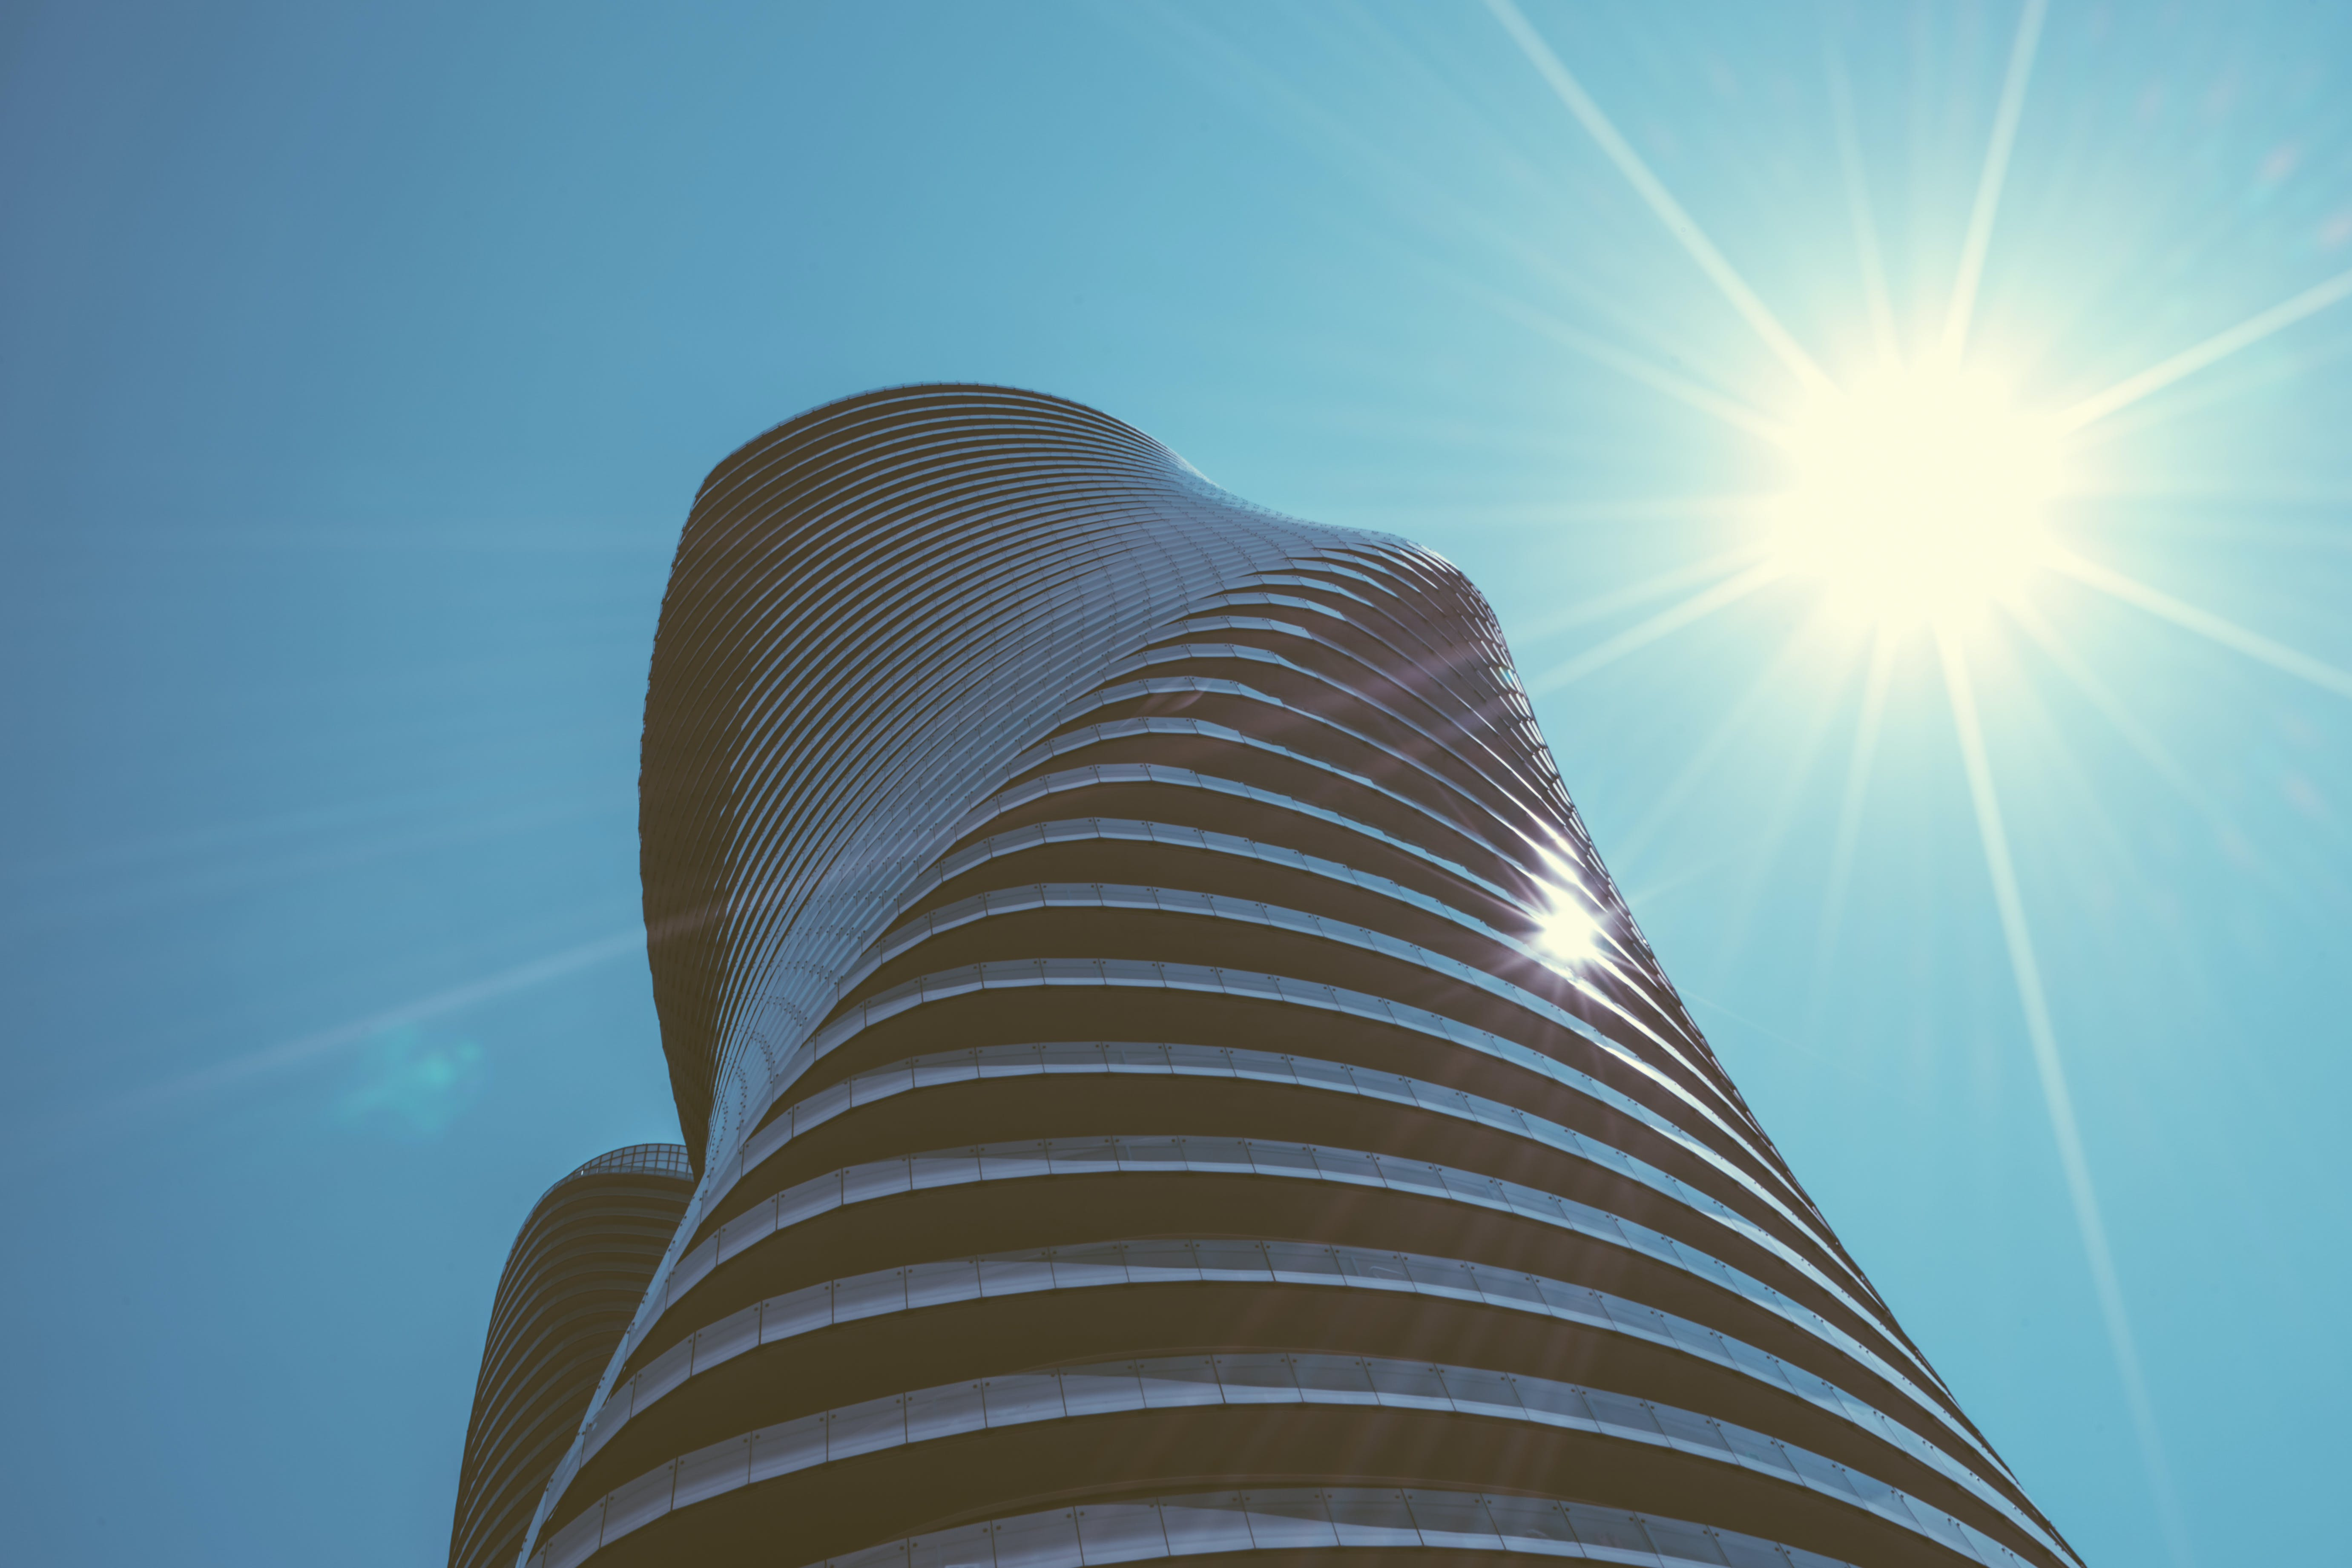 Free stock photo of sky, art, sun, building